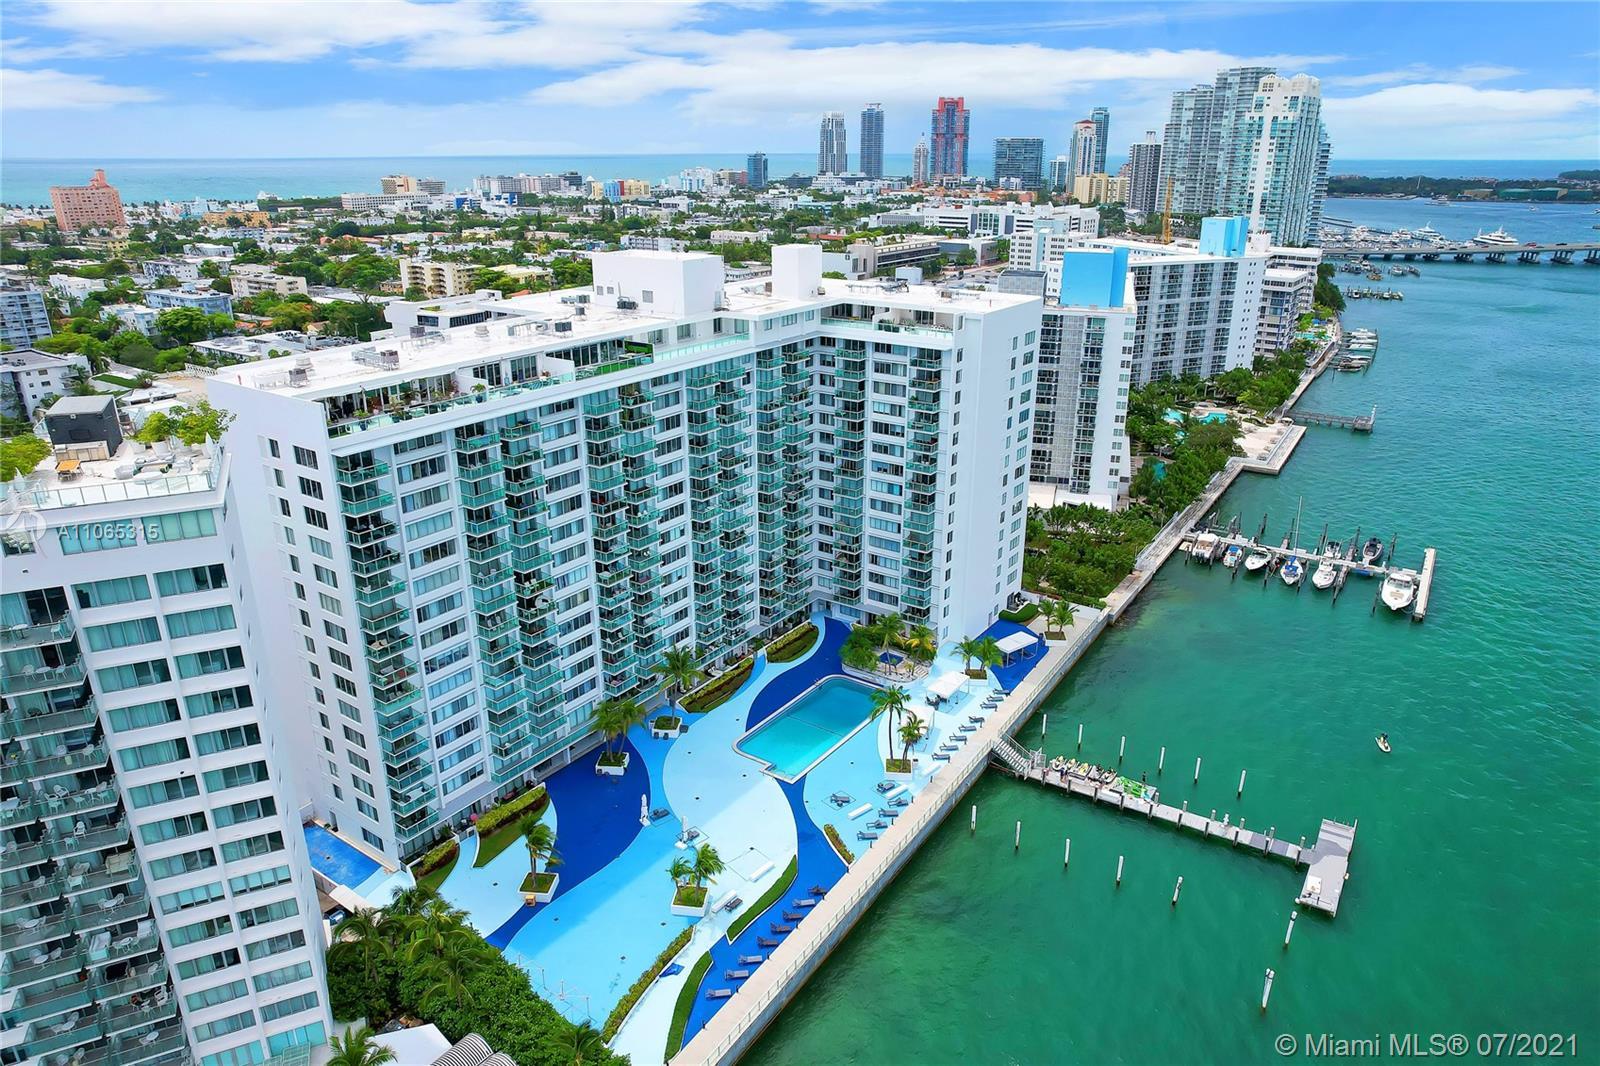 Mirador South #829 - 1000 West Ave #829, Miami Beach, FL 33139